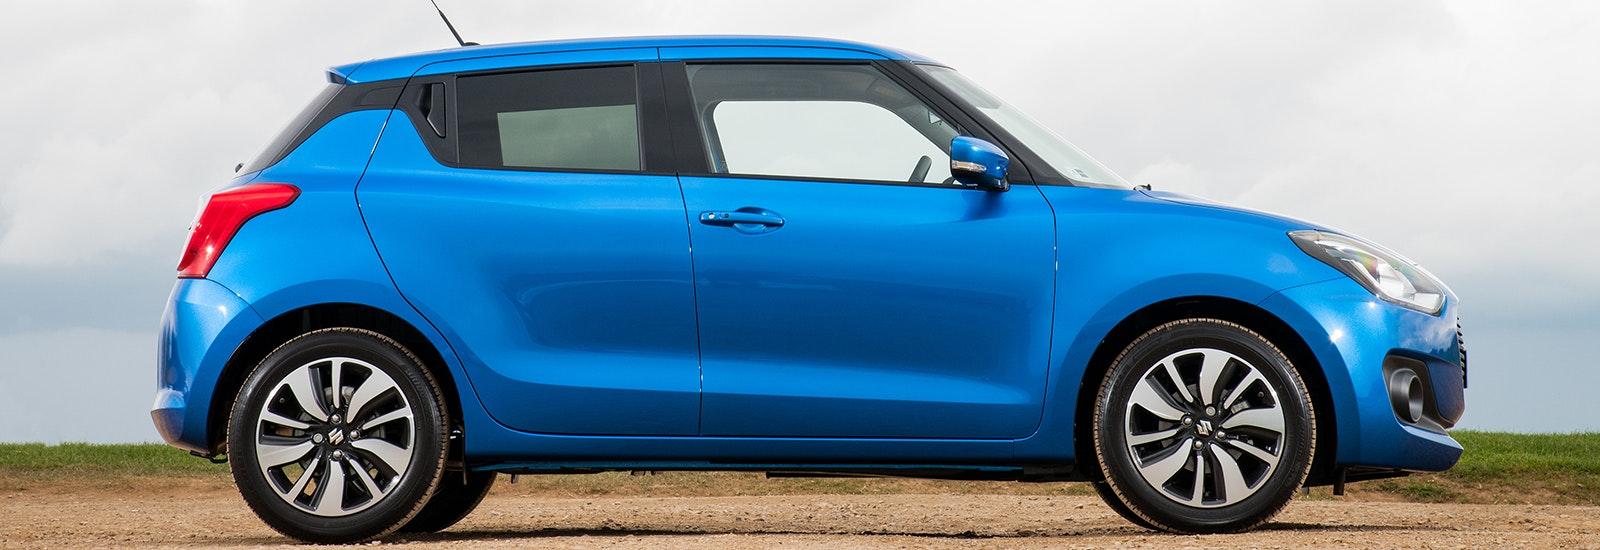 Suzuki swift length